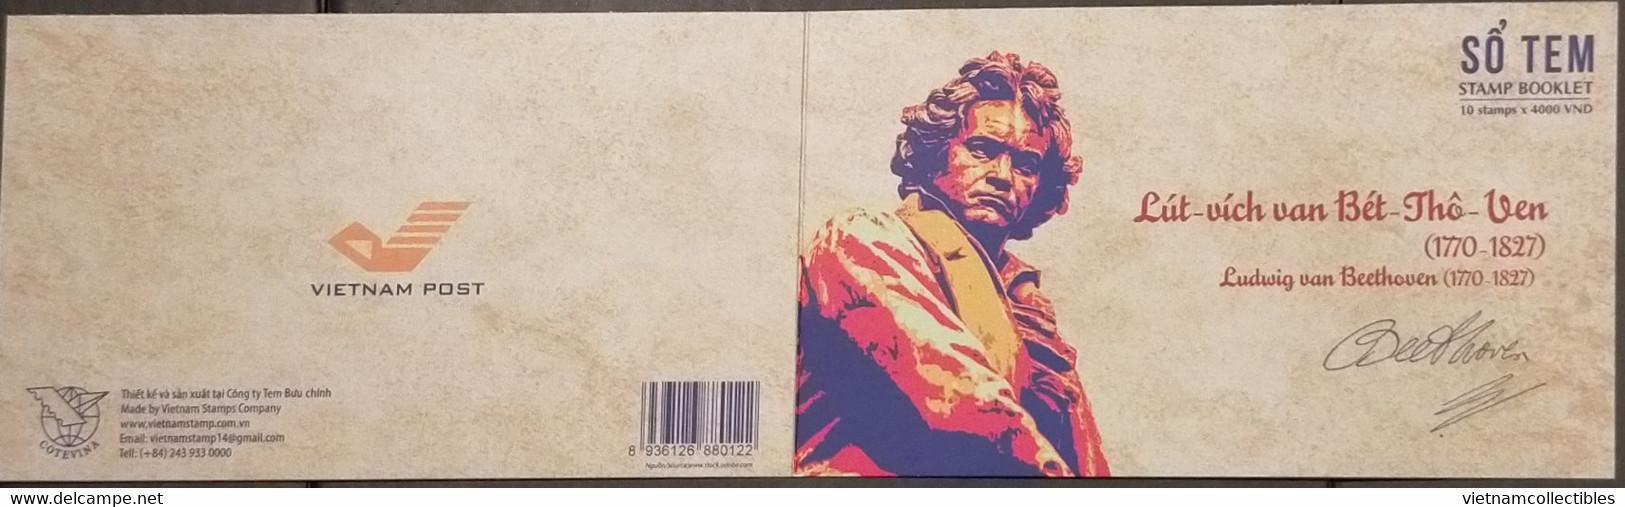 Vietnam Viet Nam Booklet 2020 : 250th Birth Anniversary Of Ludwig Van Beethoven / Music (Ms1139) - Vietnam